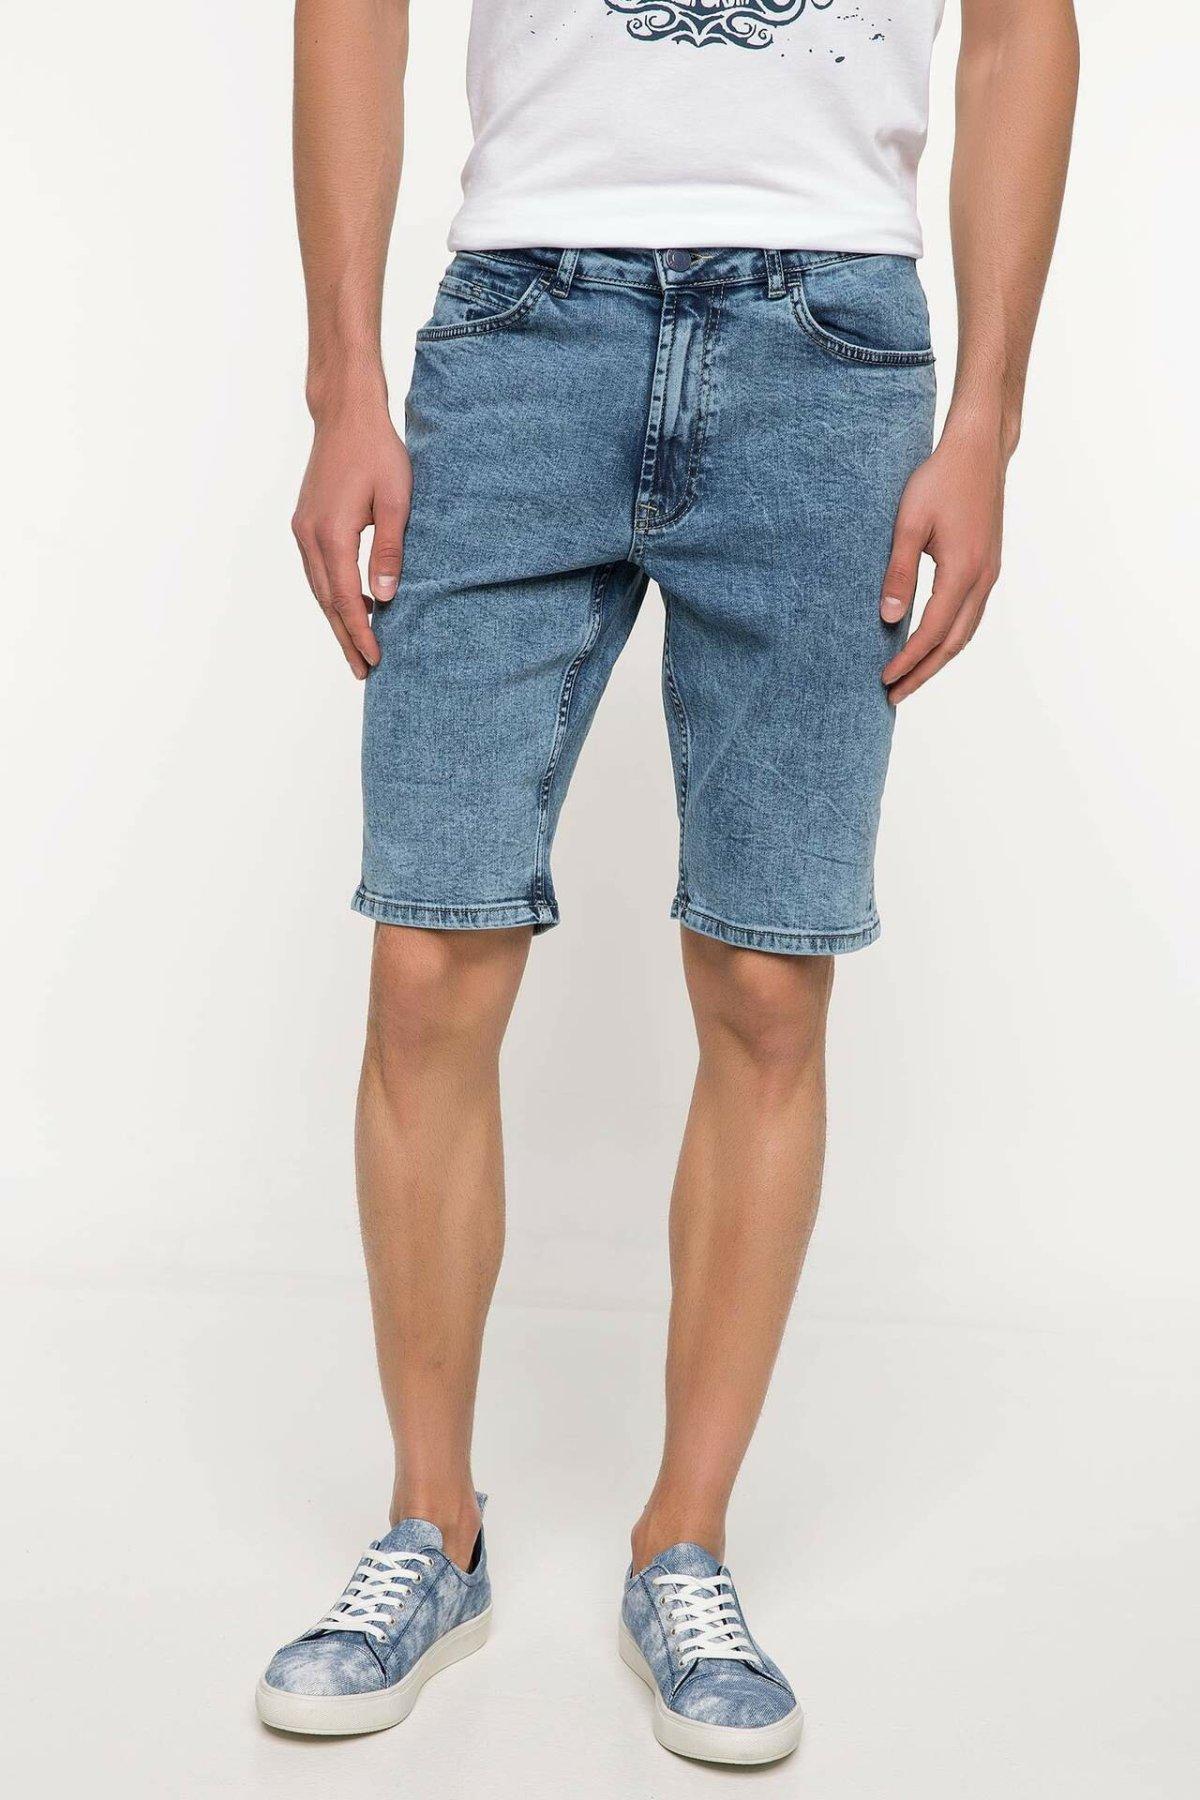 DeFacto Man Summer Denim Shorts Men Casual Straight Denim Short Pants Male Light Bluse Denim Bermuda-I6165AZ18SM